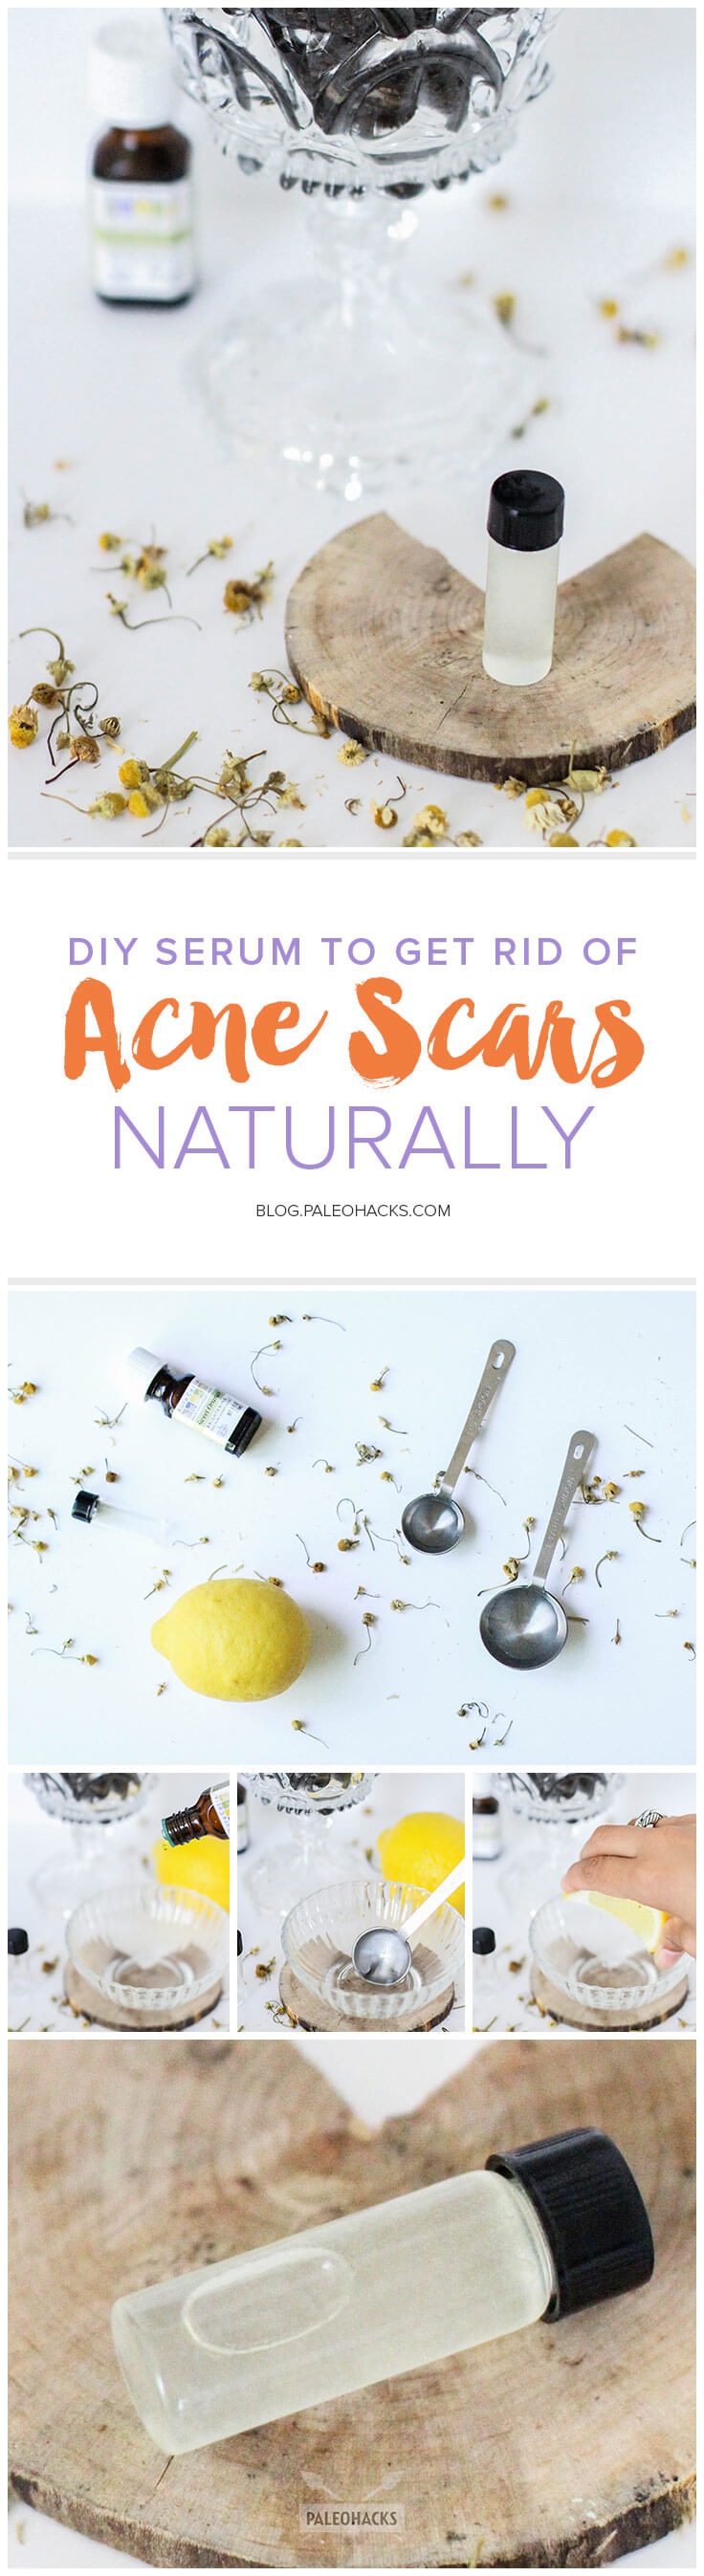 Beauty-pin-DIY-Serum-to-Get-Rid-of-Acne-Scars-Naturally.jpg